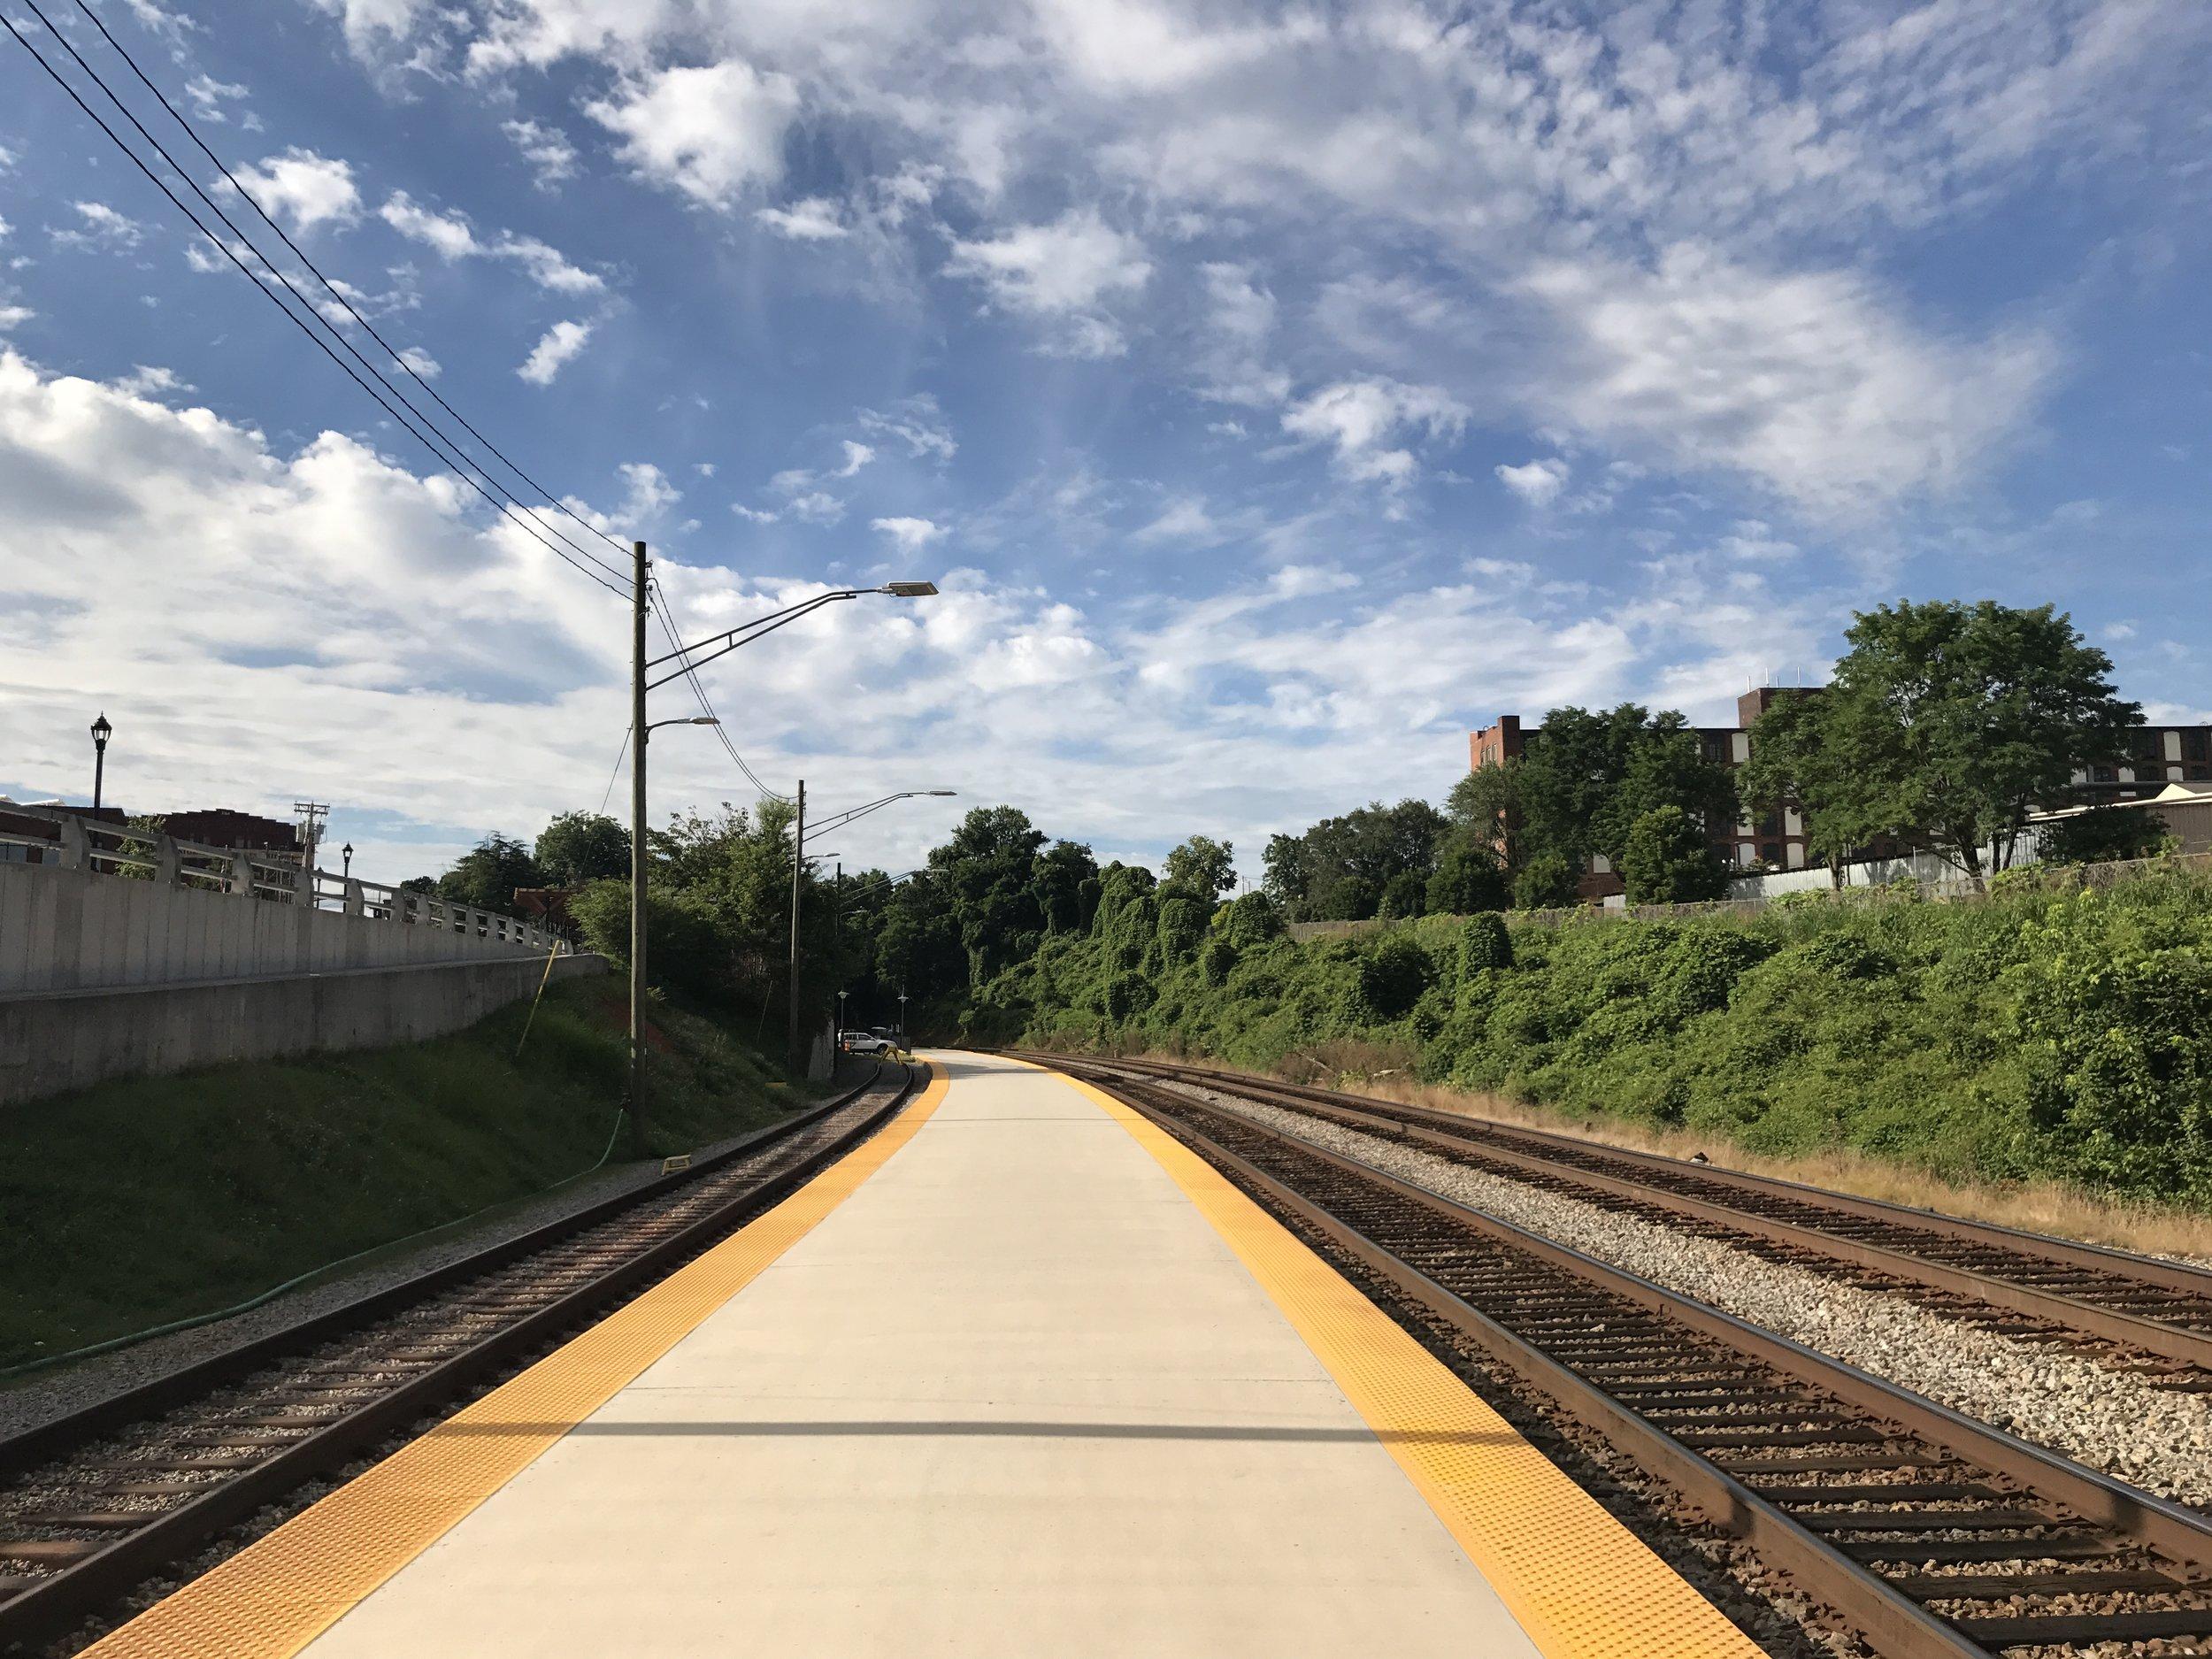 Amtrak platform, Lynchburg, VA